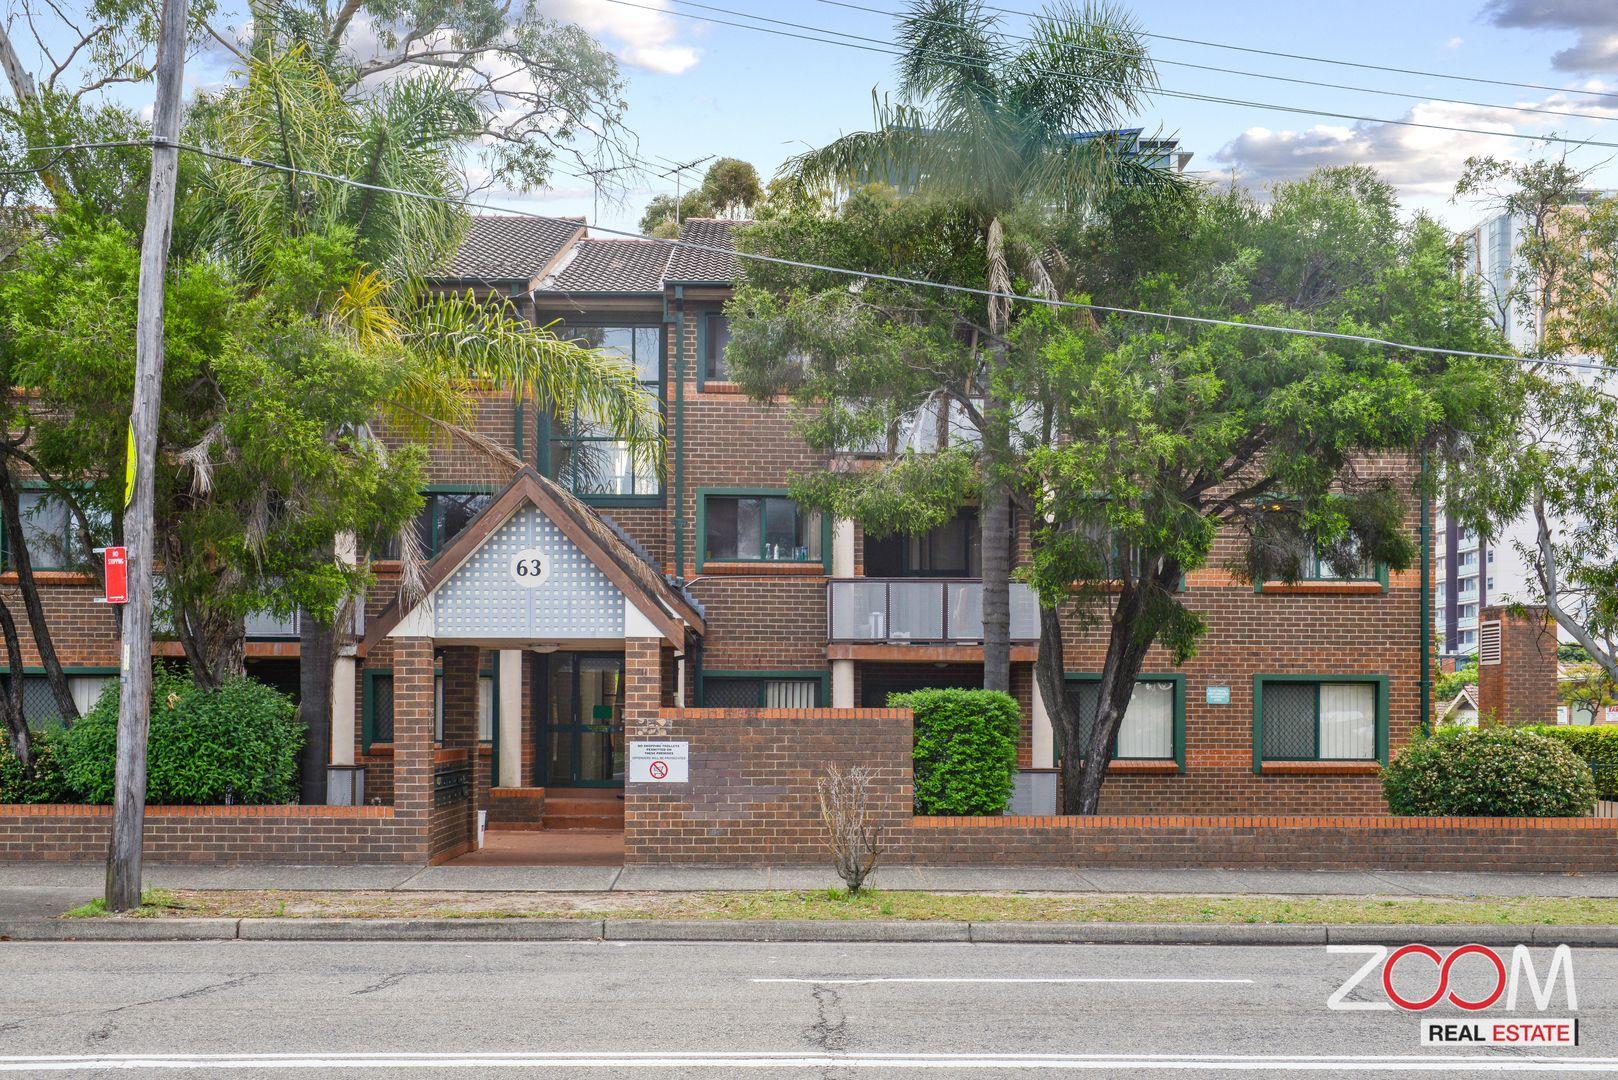 13/59-63 Shaftesbury Road, Burwood NSW 2134, Image 0